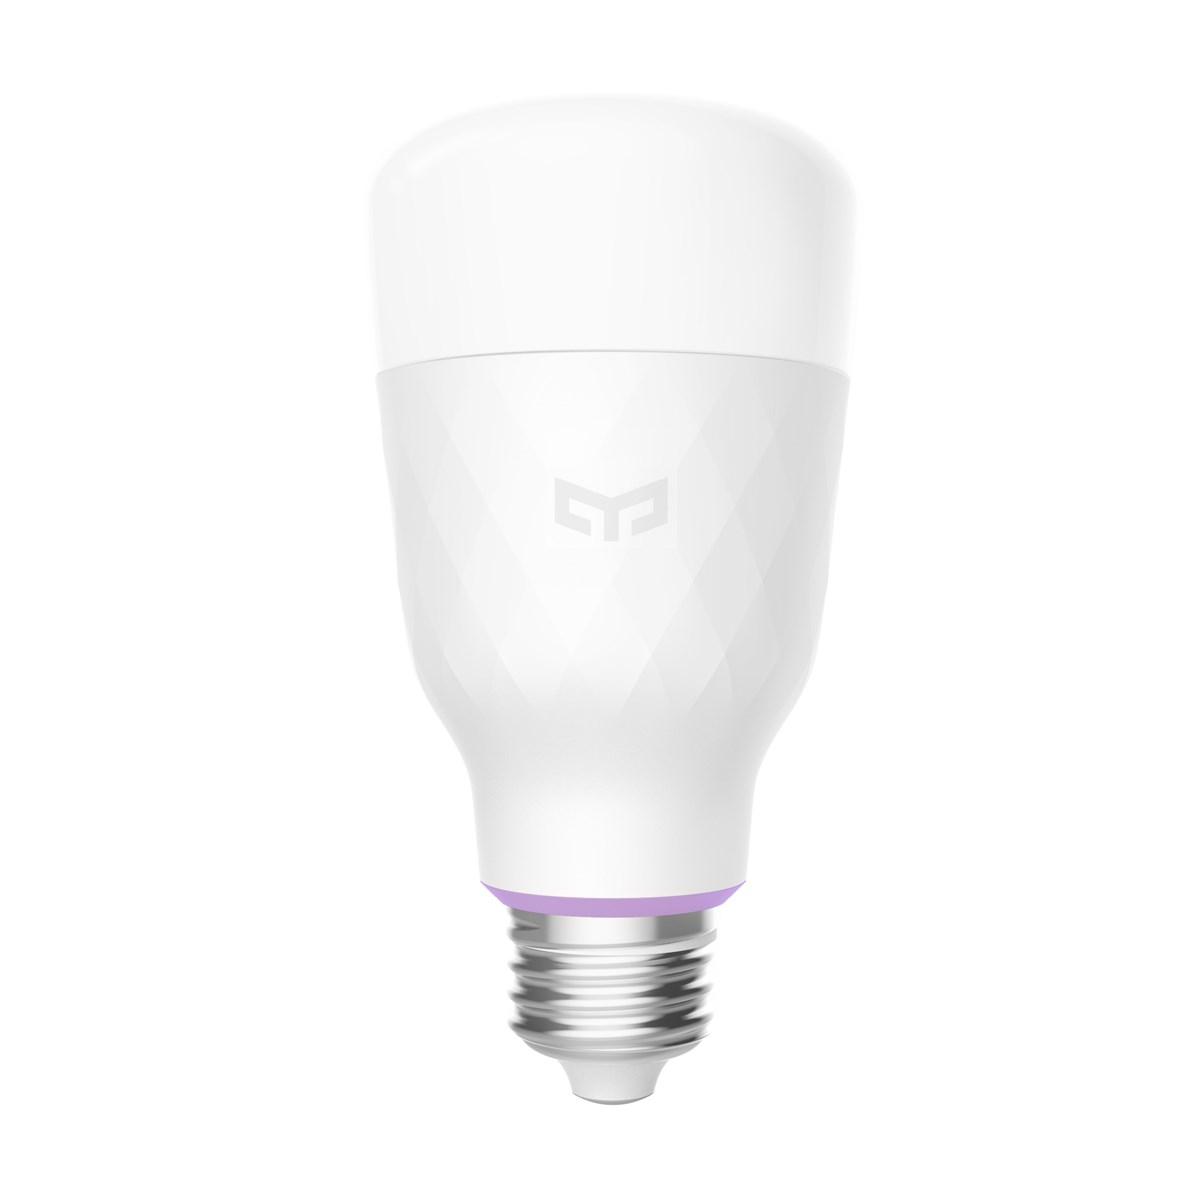 3PCS Yeelight YLDP06YL E27 10W RGBW Smart LED Bulb Work With Amazon Alexa AC100-240V(Xiaomi Ecosystem Product)